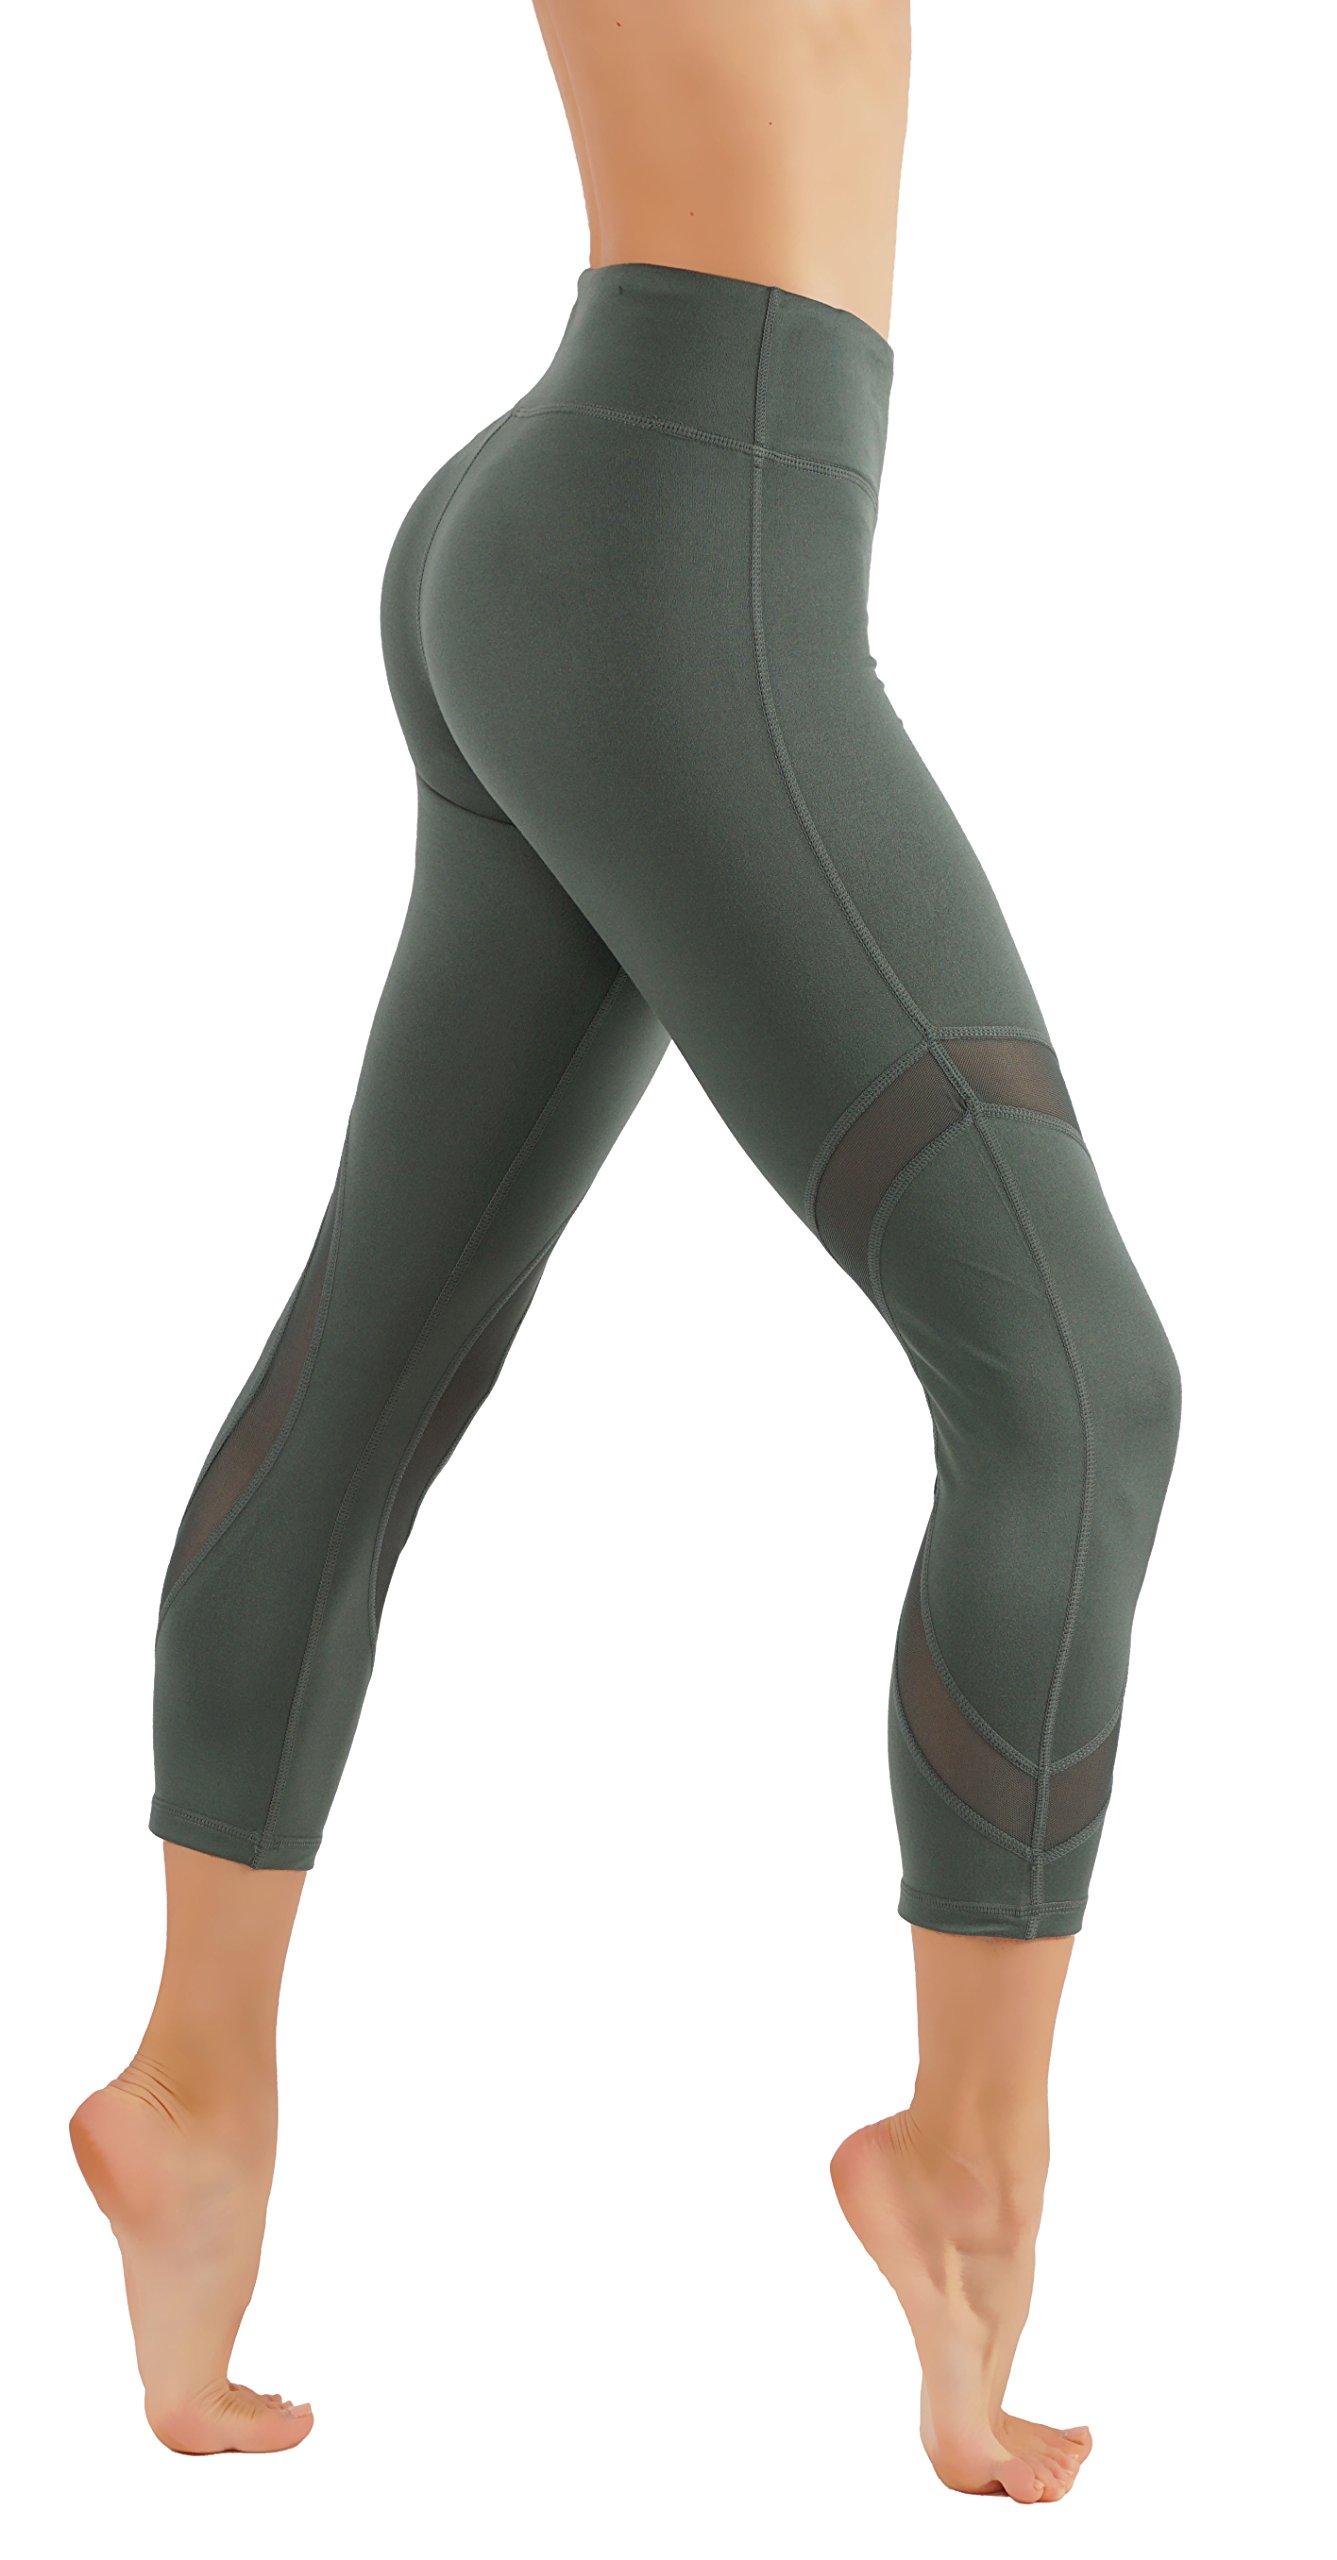 CodeFit Yoga Pants Power Flex Dry-Fit Capri Leggings Mesh Panels Workout in Style (L USA 4-6, CF322-KIW)